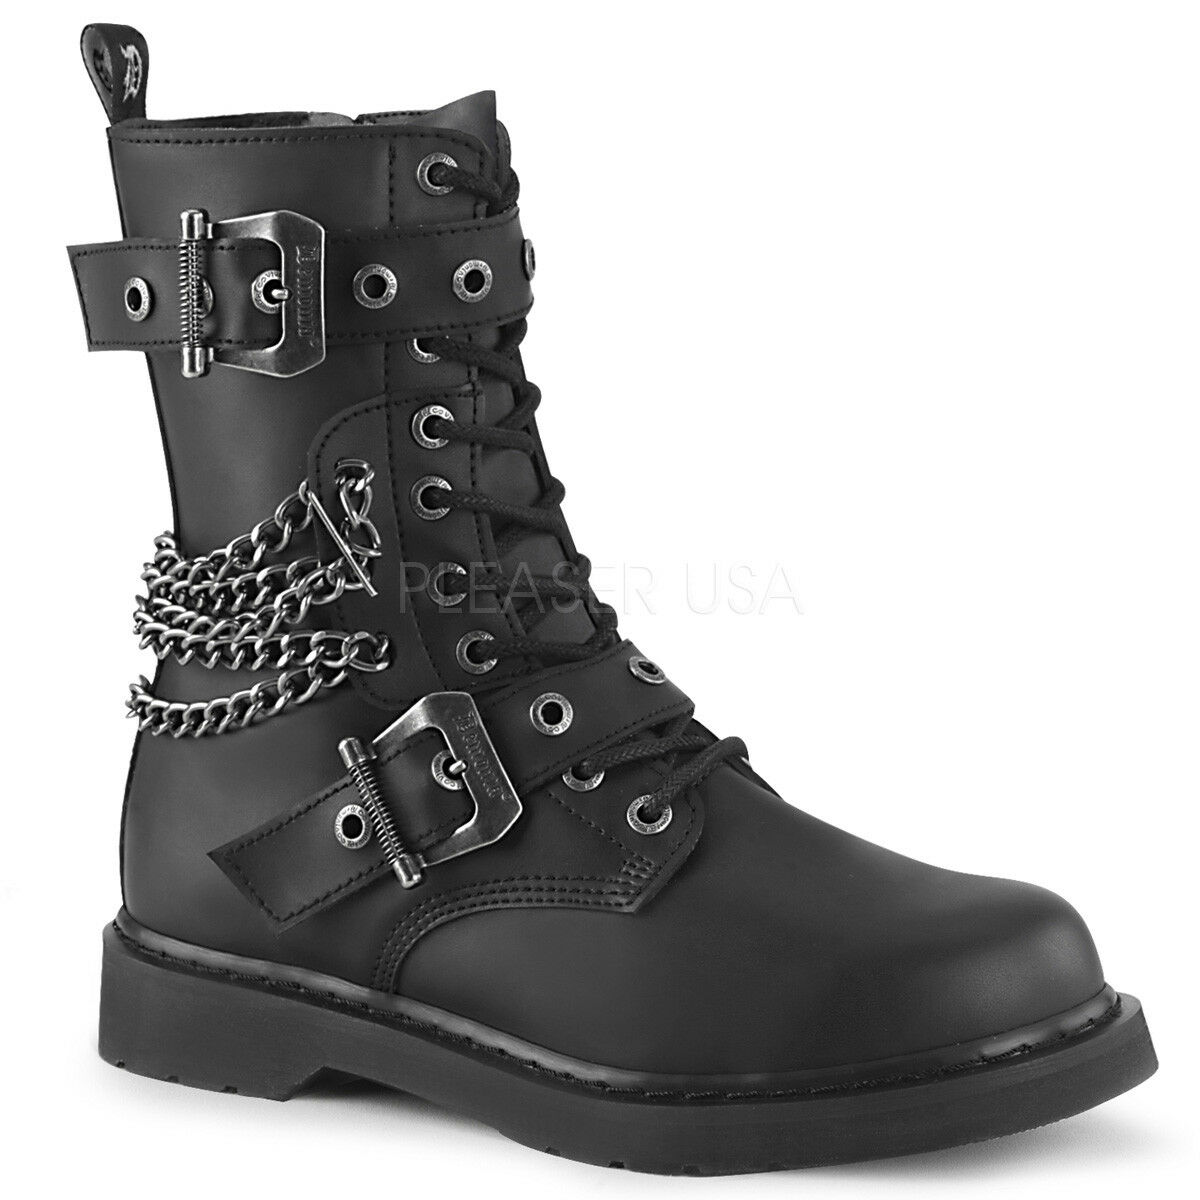 DEMONIA Womens Punk Combat 1 1 1 1 4  Heel 10 Eyelet Buckles & Chains Mid Calf Boots c05d42